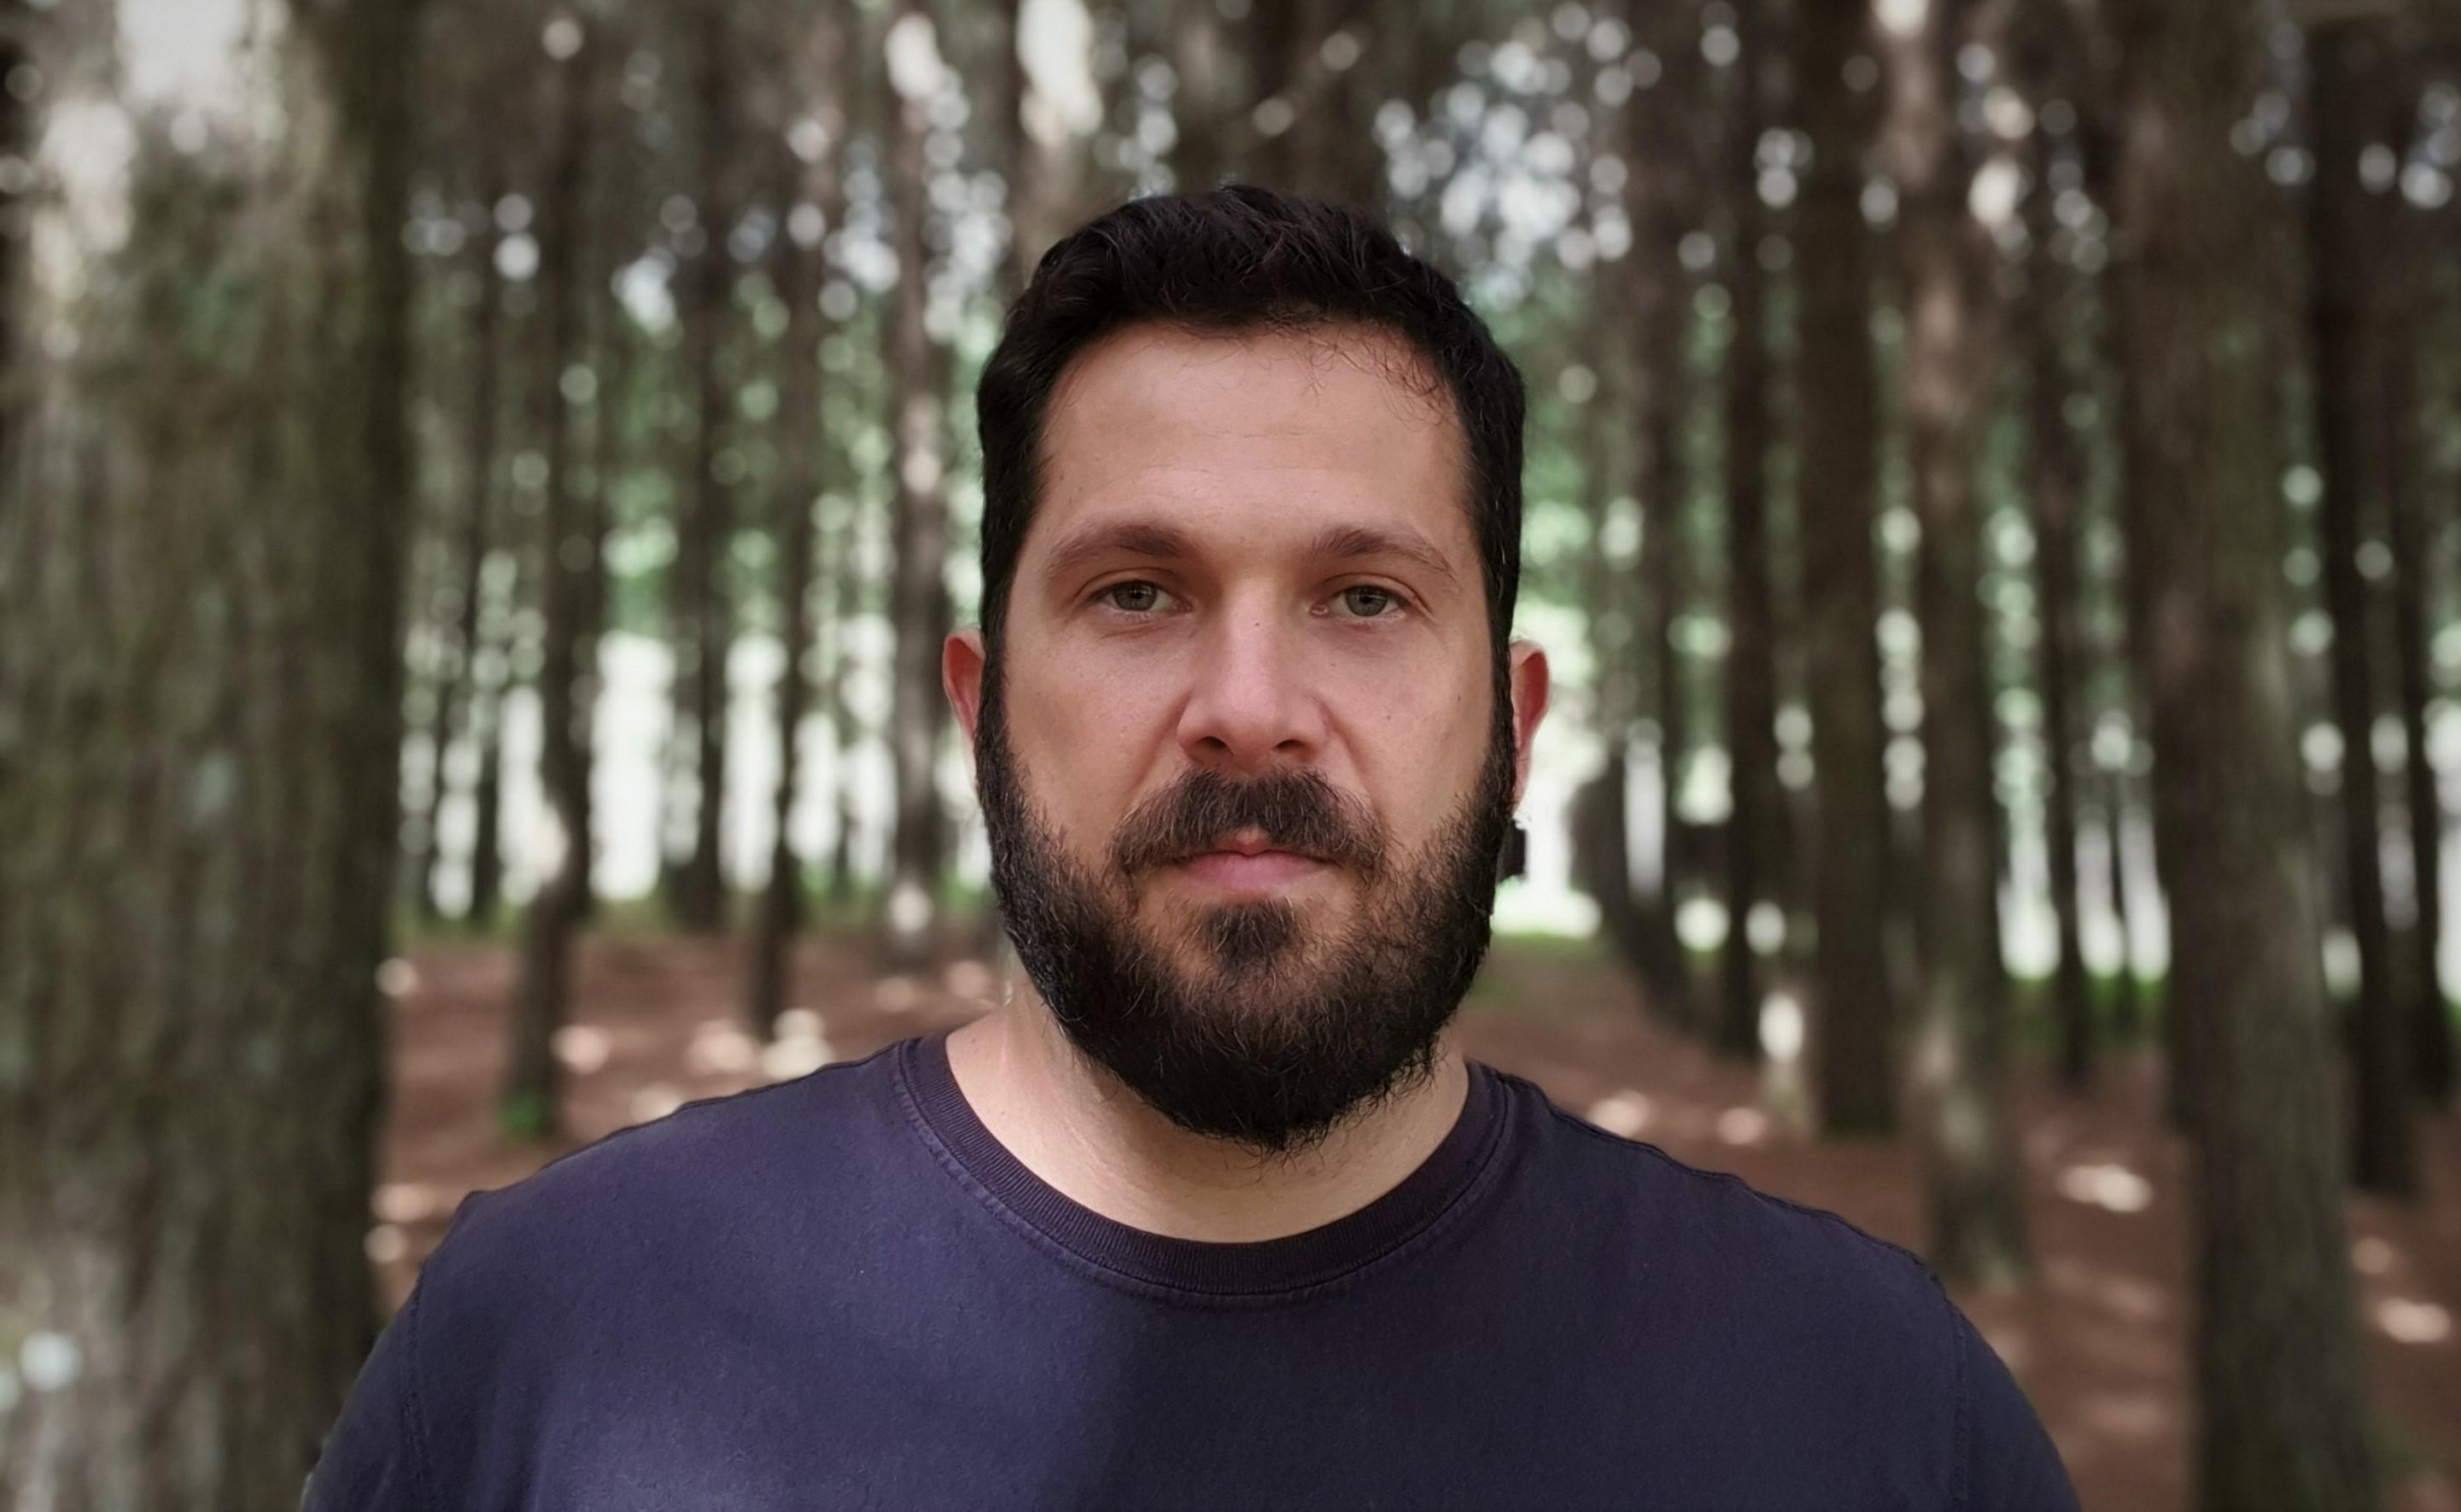 Diogo Machado, da Quiron Digital